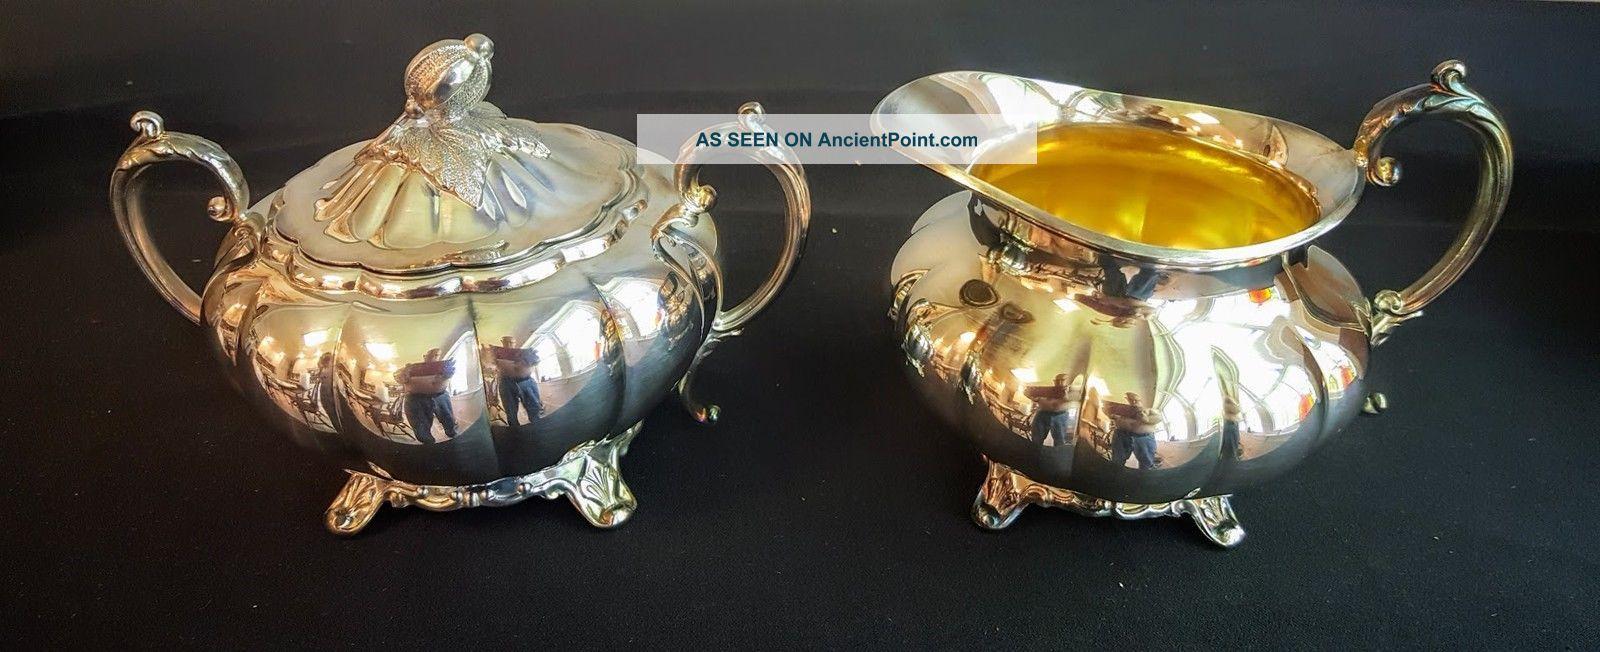 Creamer & Sugar Oneida Community Silver Sheffield Design Melon Shape Creamers & Sugar Bowls photo